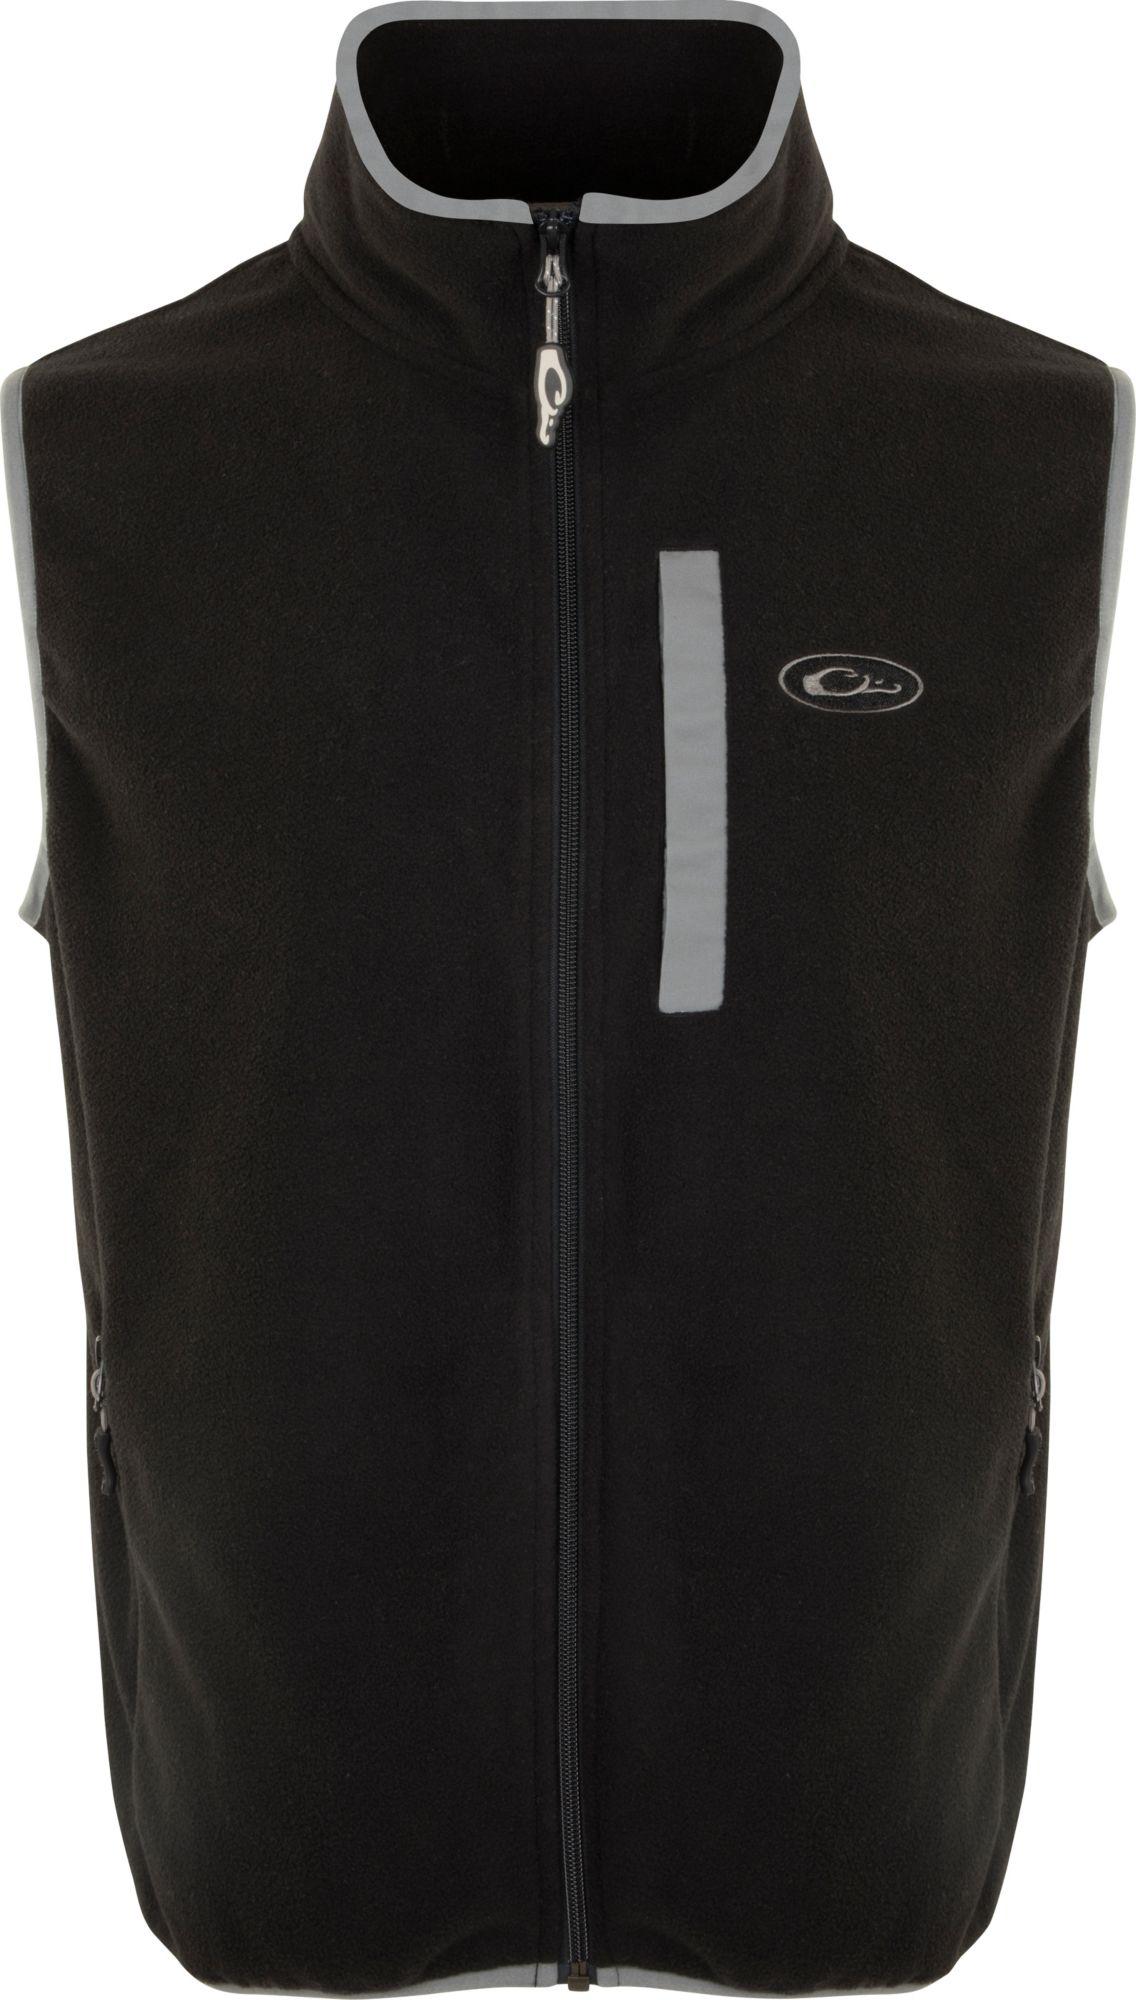 Drake Waterfowl Men's Camp Fleece Vest, Size: Small, Black thumbnail